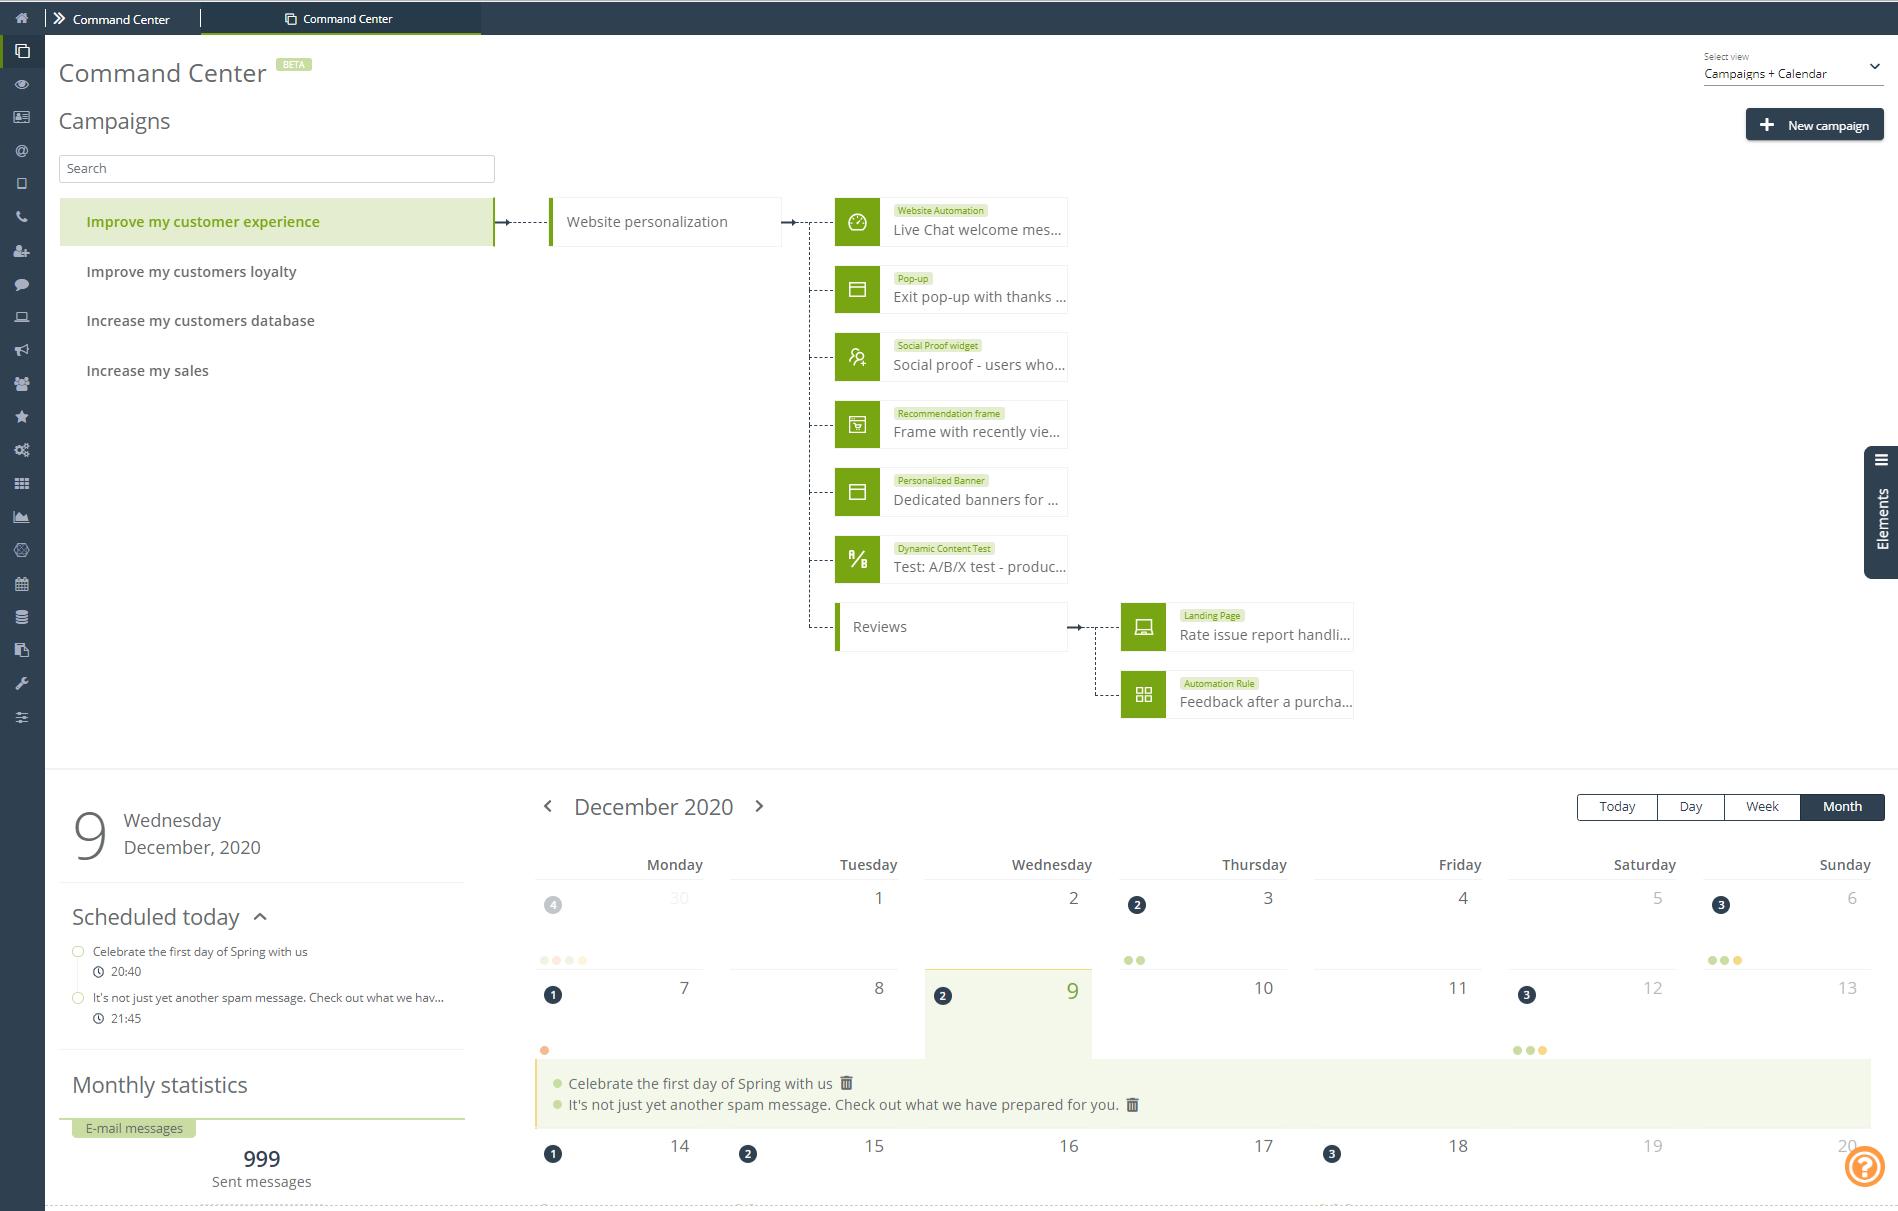 SALESmanago Marketing Automation Software - Command center